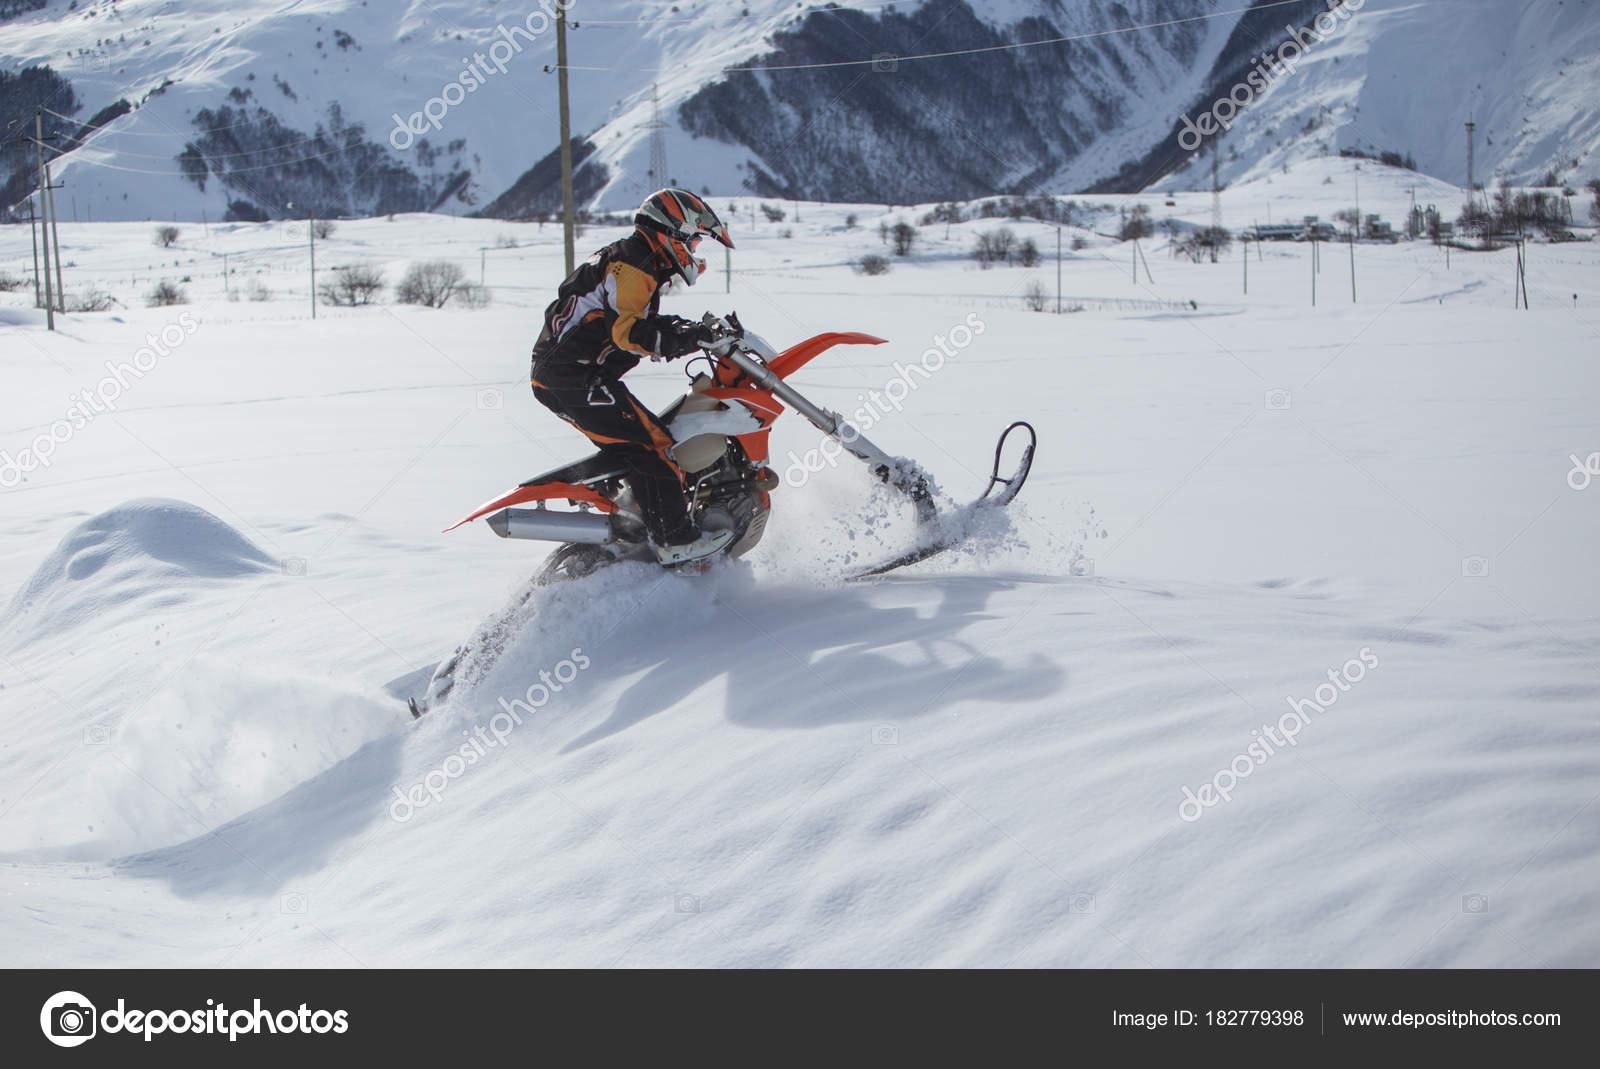 Dirt Bike Snowmobile >> Enduro Snowbike Snowmobile Journey With Dirt Bike High In